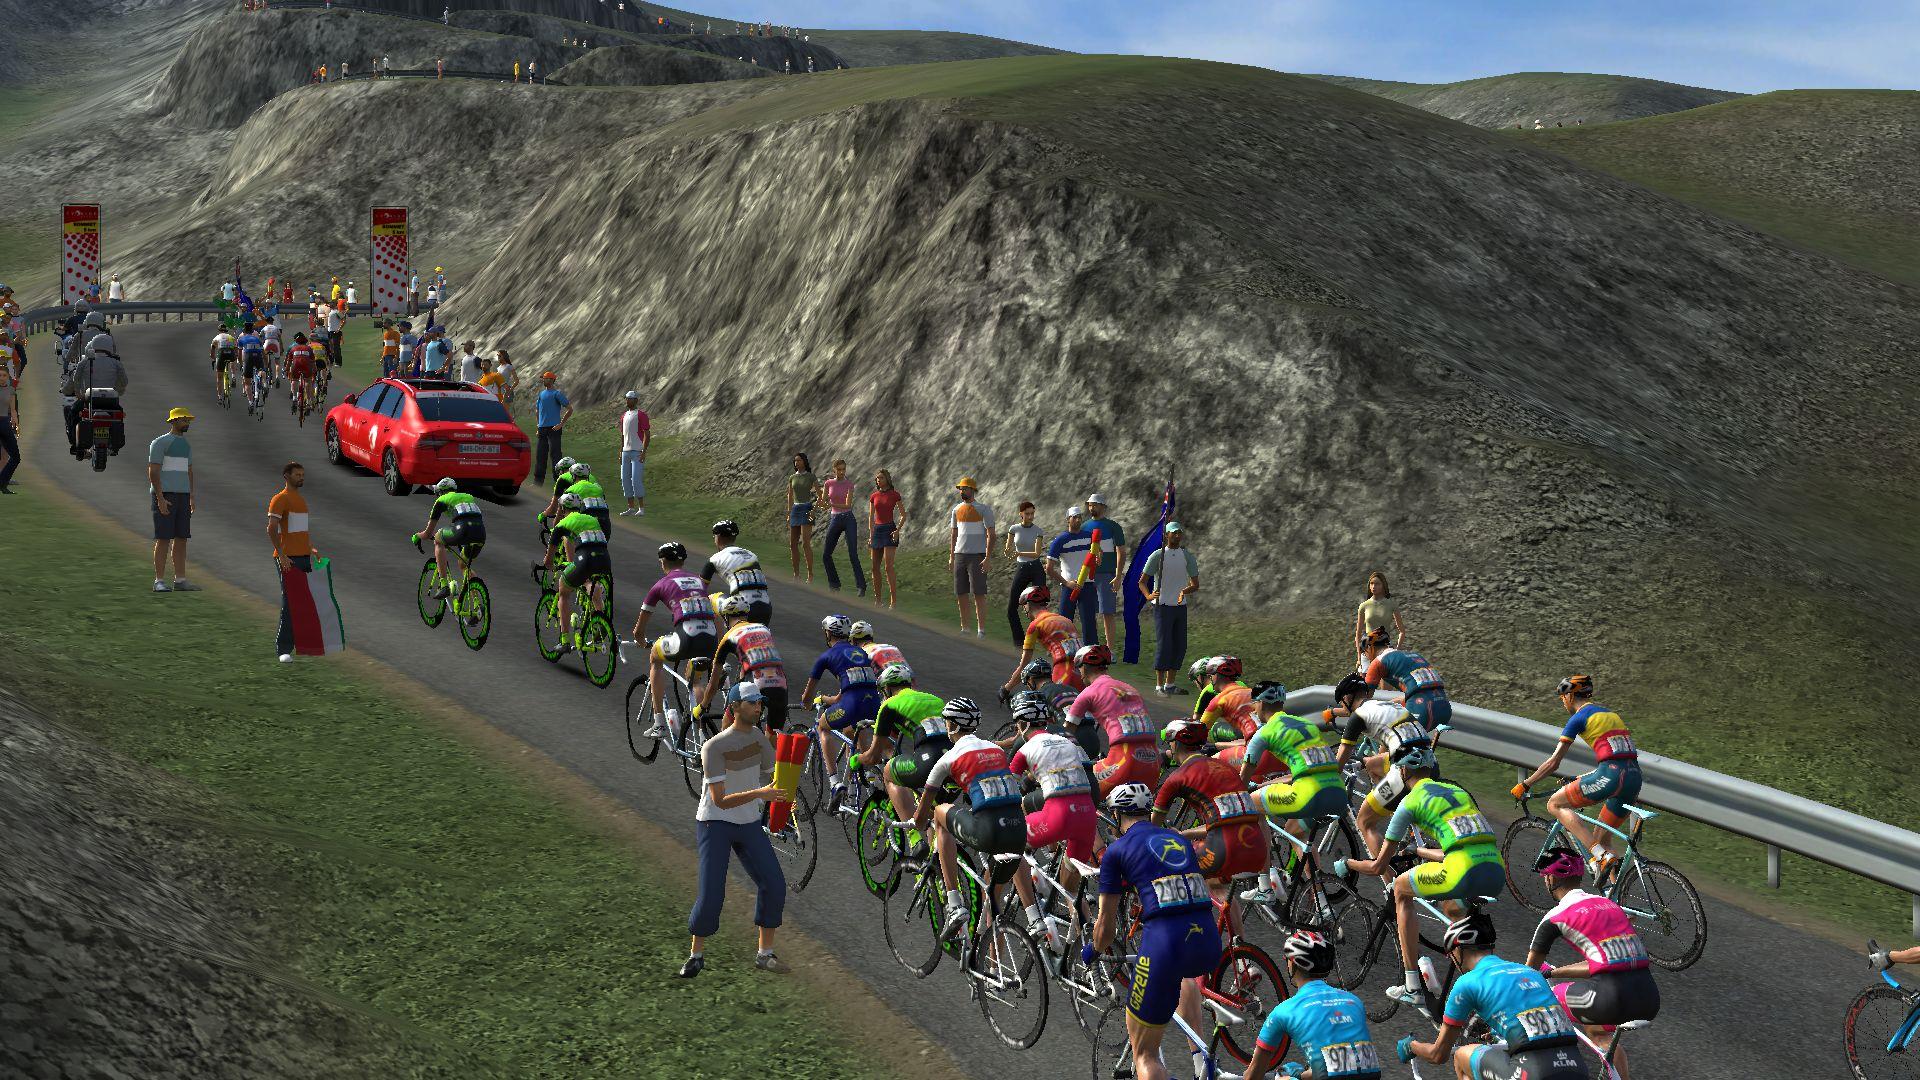 pcmdaily.com/images/mg/2019/Races/GTM/Giro/mg19_giro_12_PCM0079.jpg